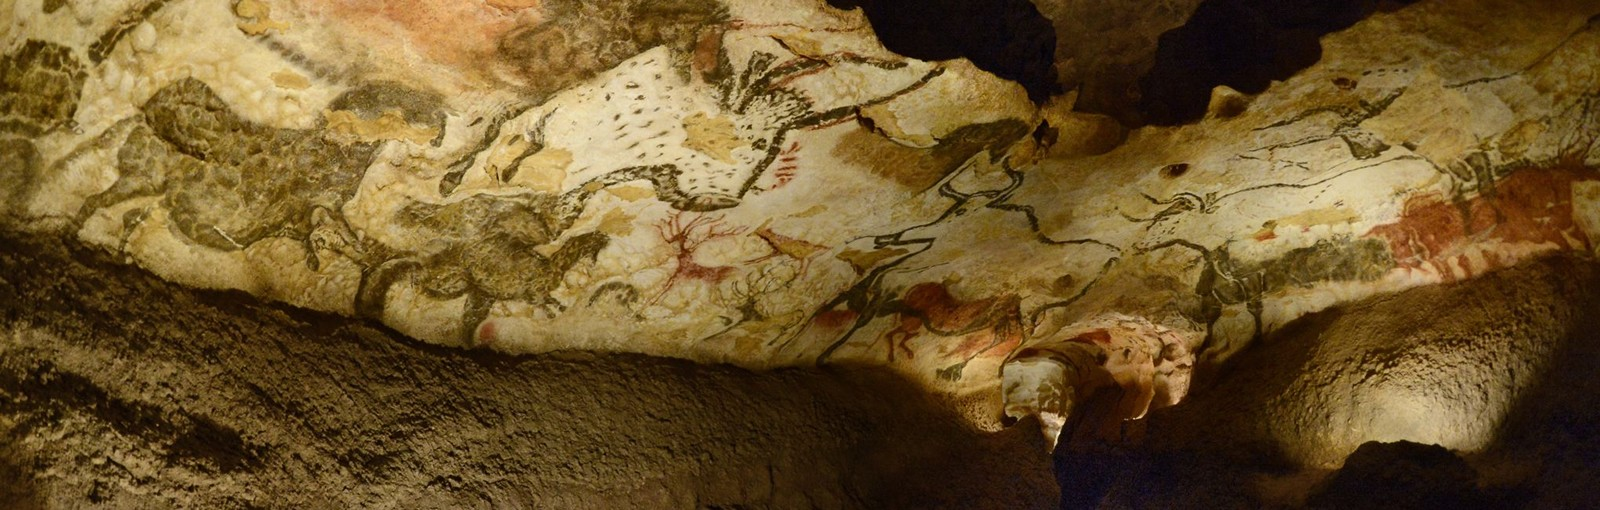 Tours In the footsteps of Cro Magnon - Dordogne & Aquitaine - Regional tours